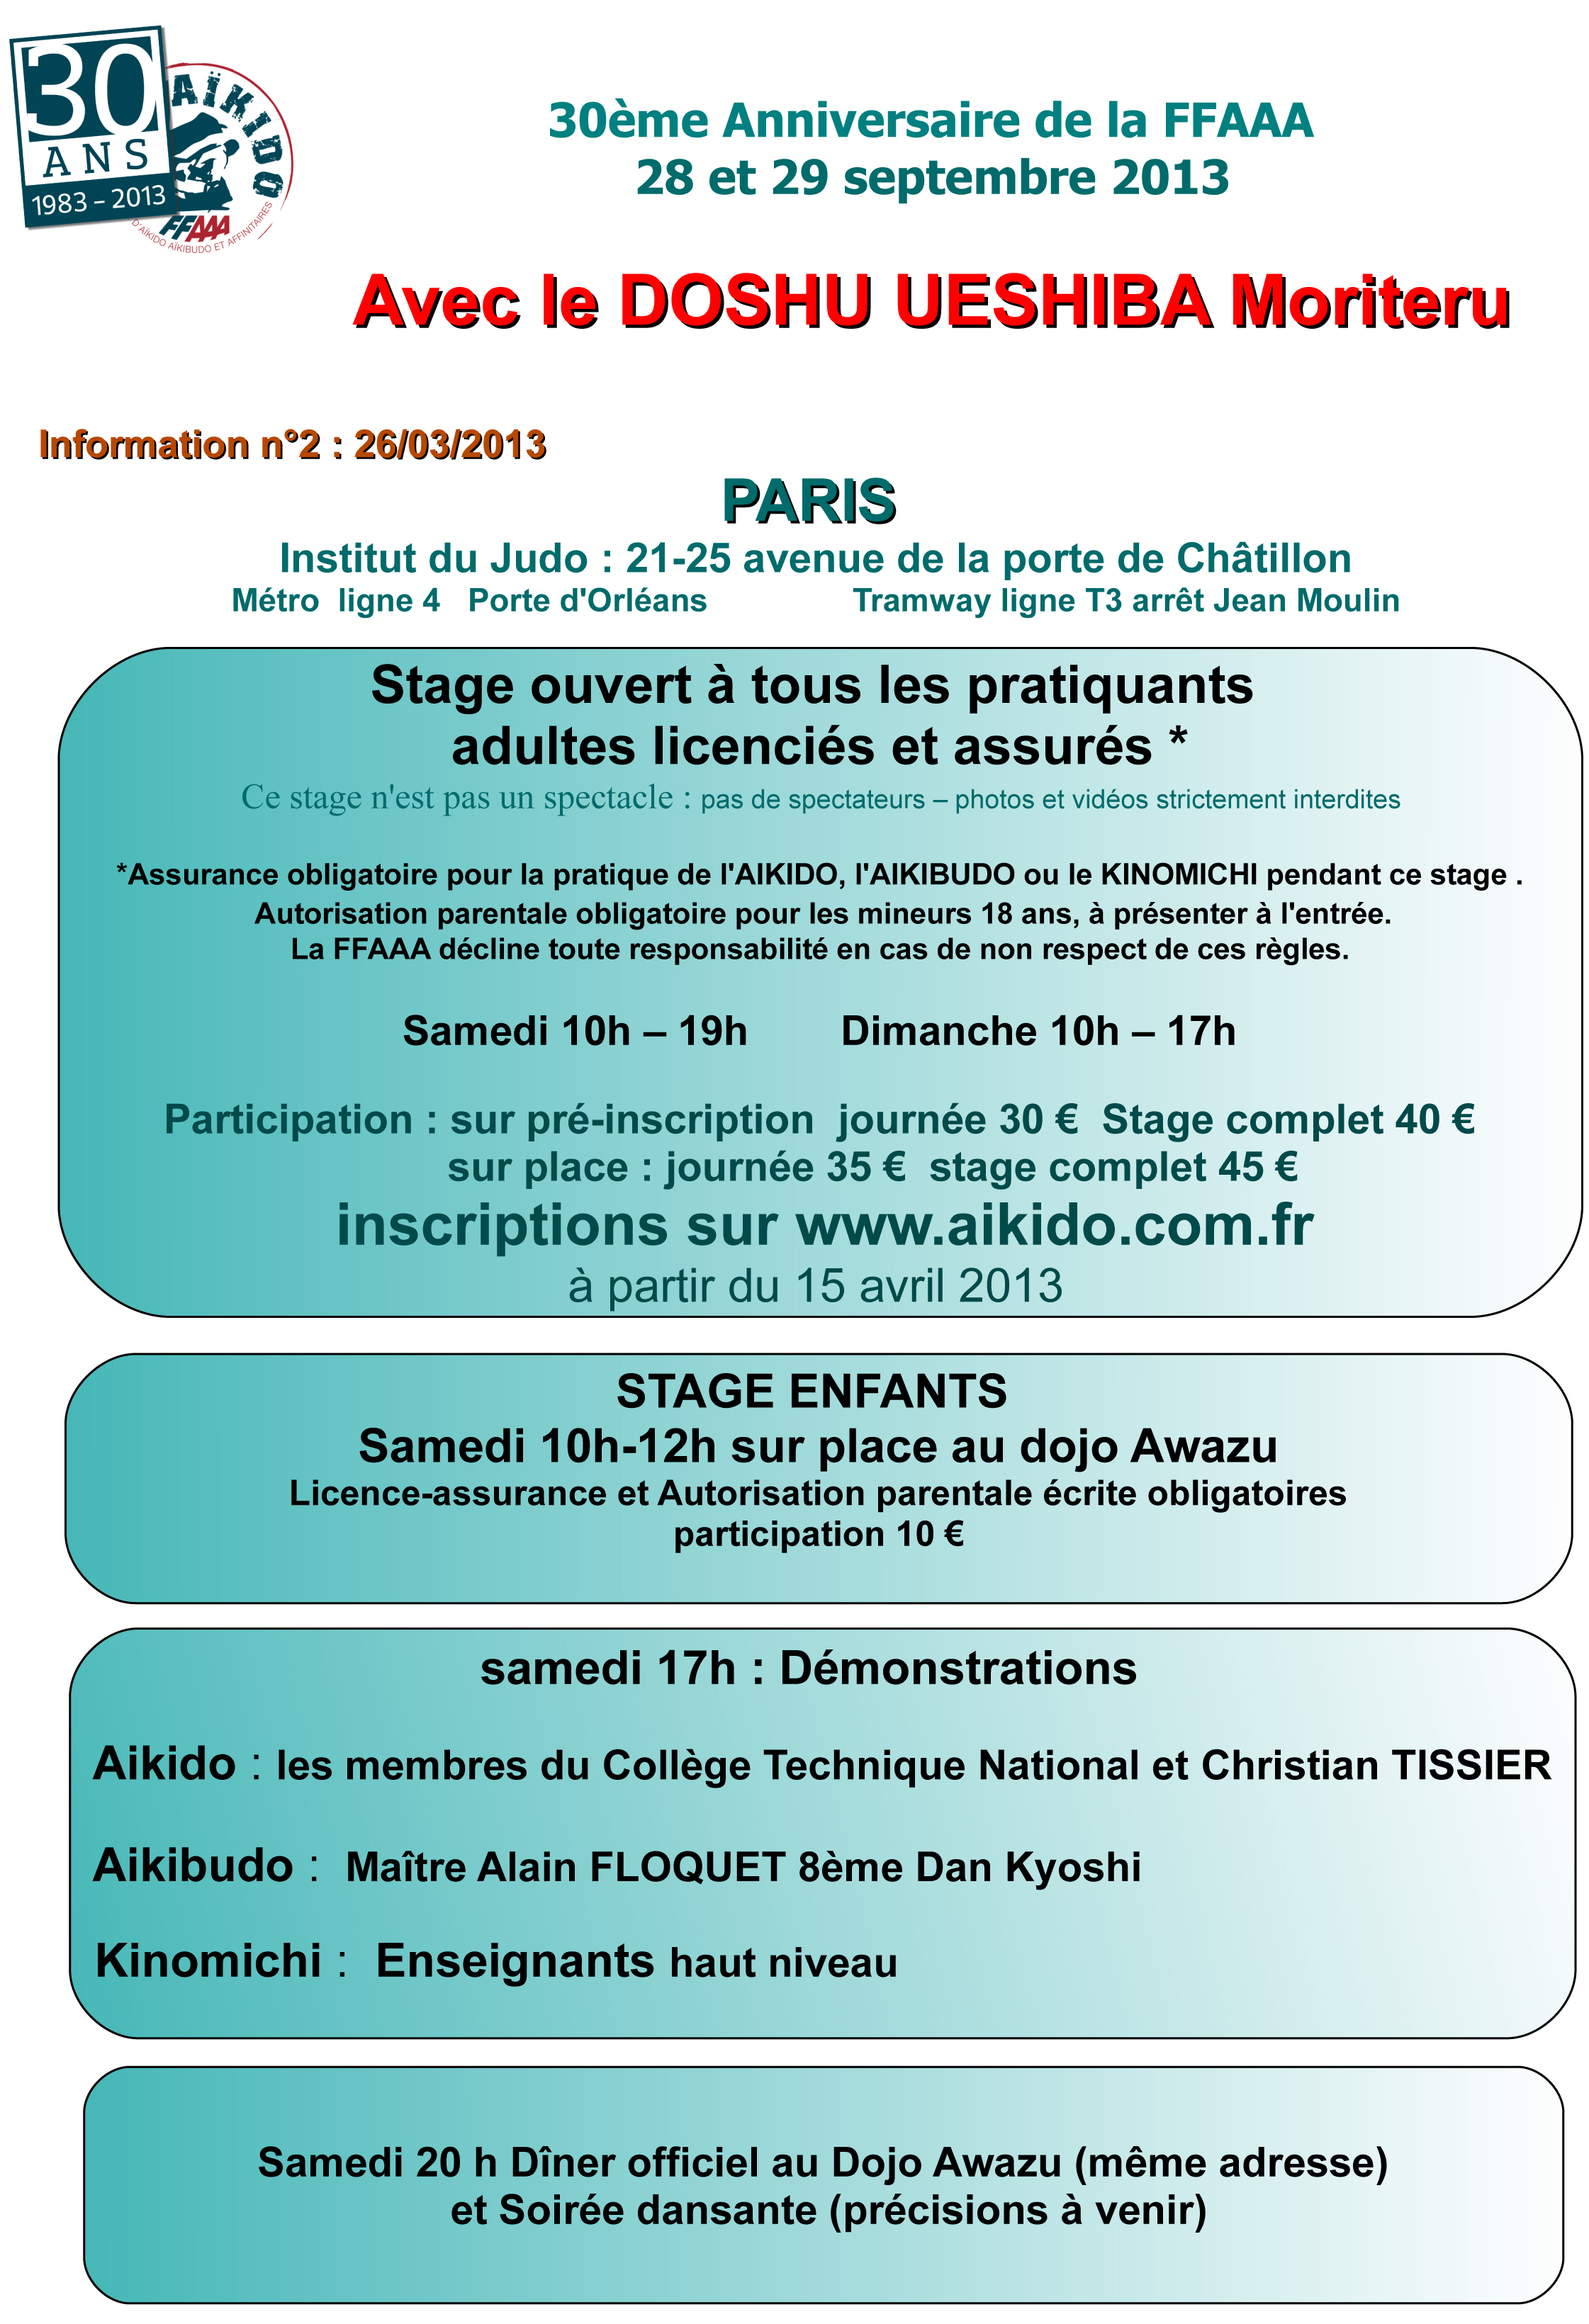 30 anniversario ffaaa parigiaiki dojo roma - Institut national du judo porte de chatillon ...